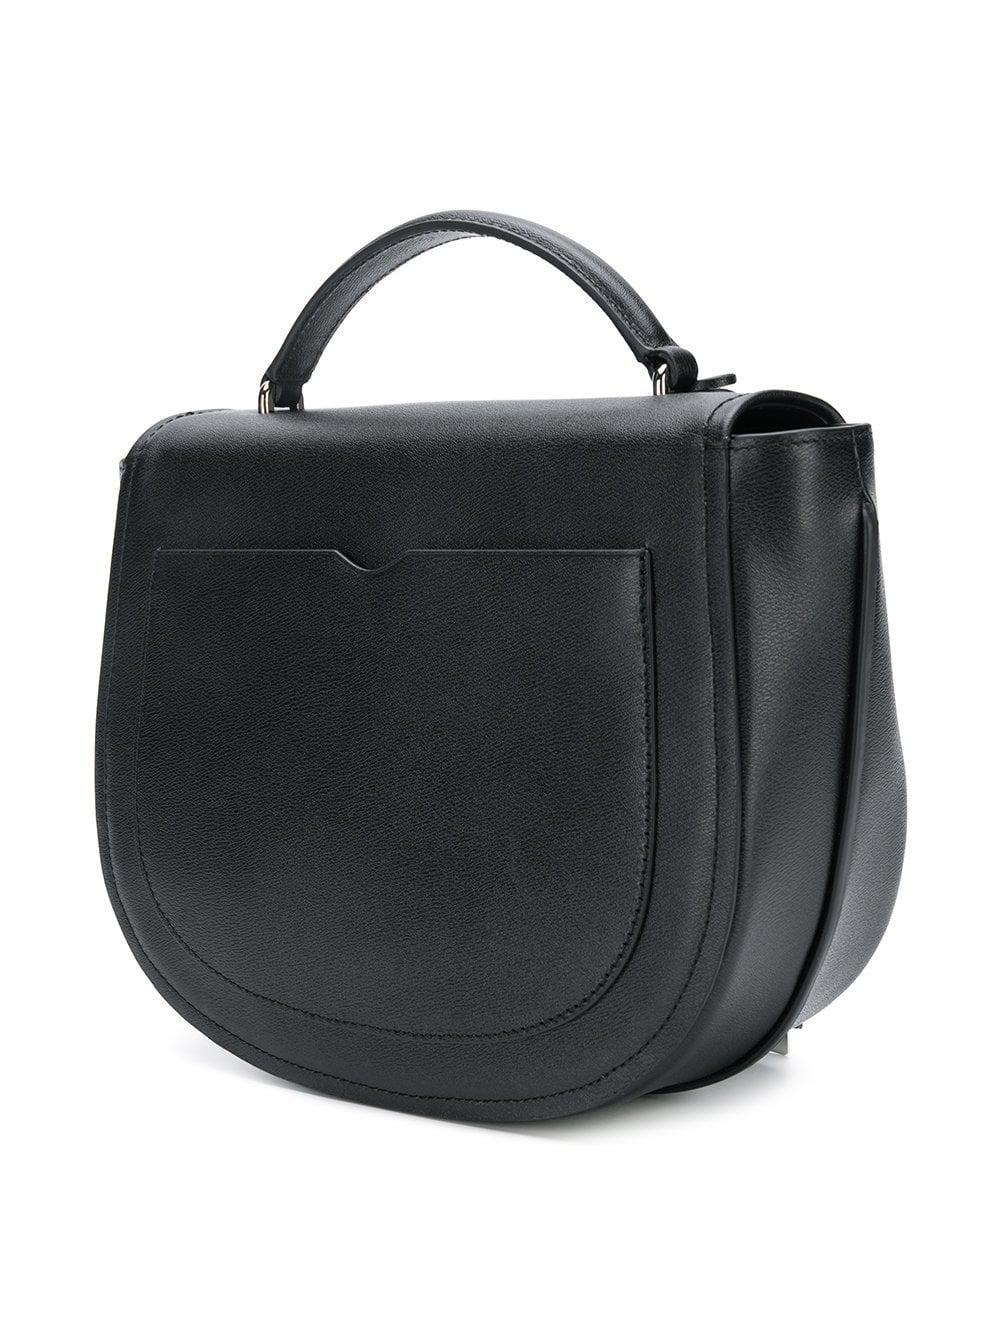 ... Black Hudson Top Handle Saddle Bag - Lyst. View fullscreen 00fc127545dd9